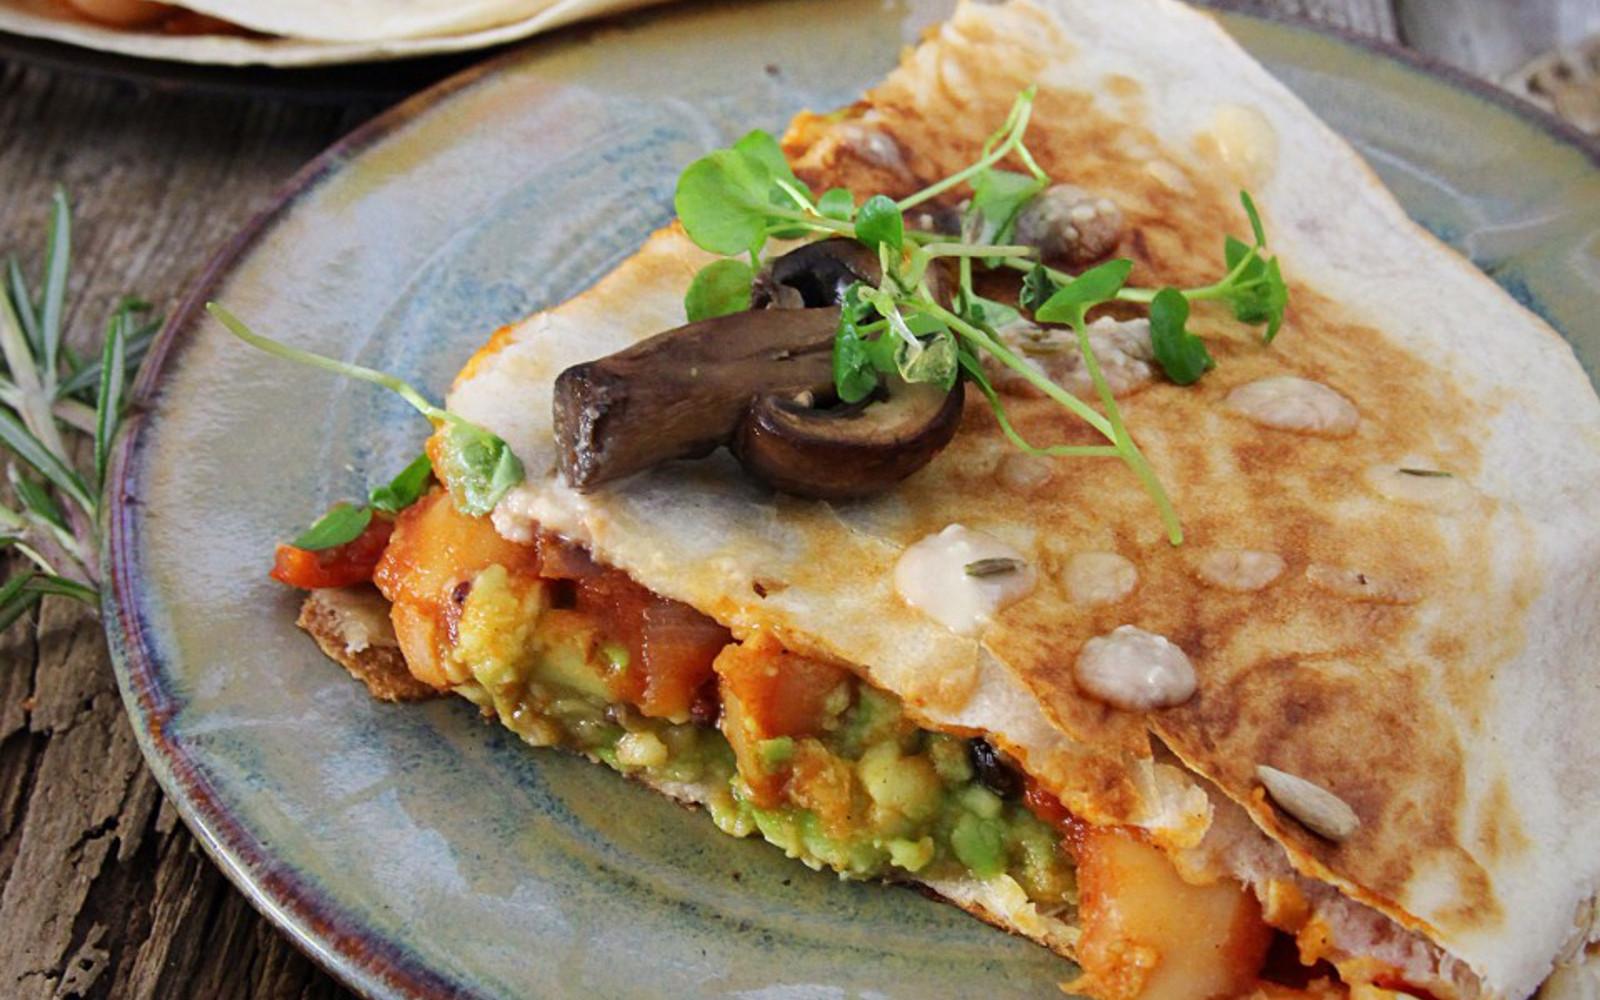 Spicy Bean, Mushroom and Avocado Quesadilla